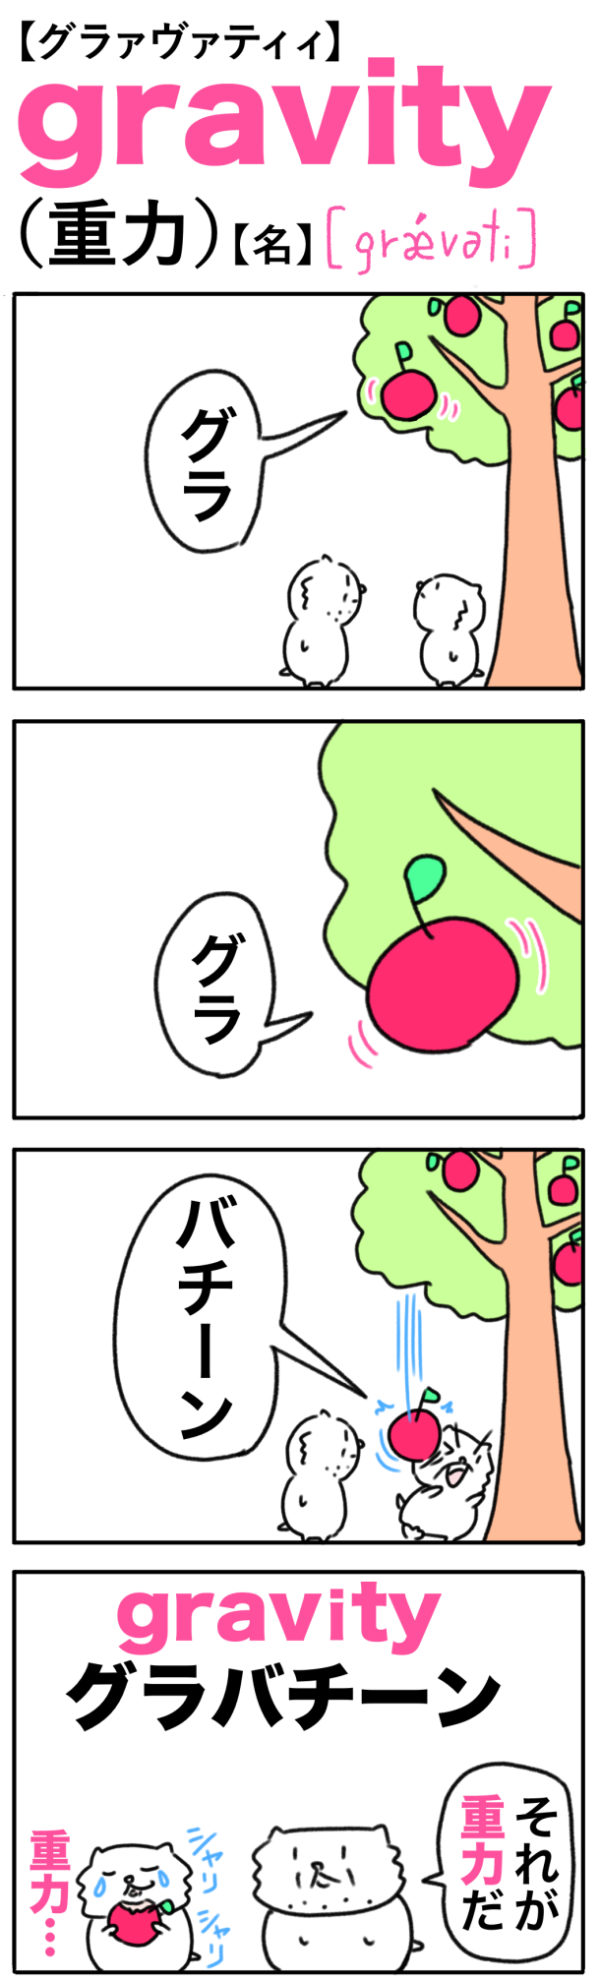 gravity(重力)の語呂合わせ英単語